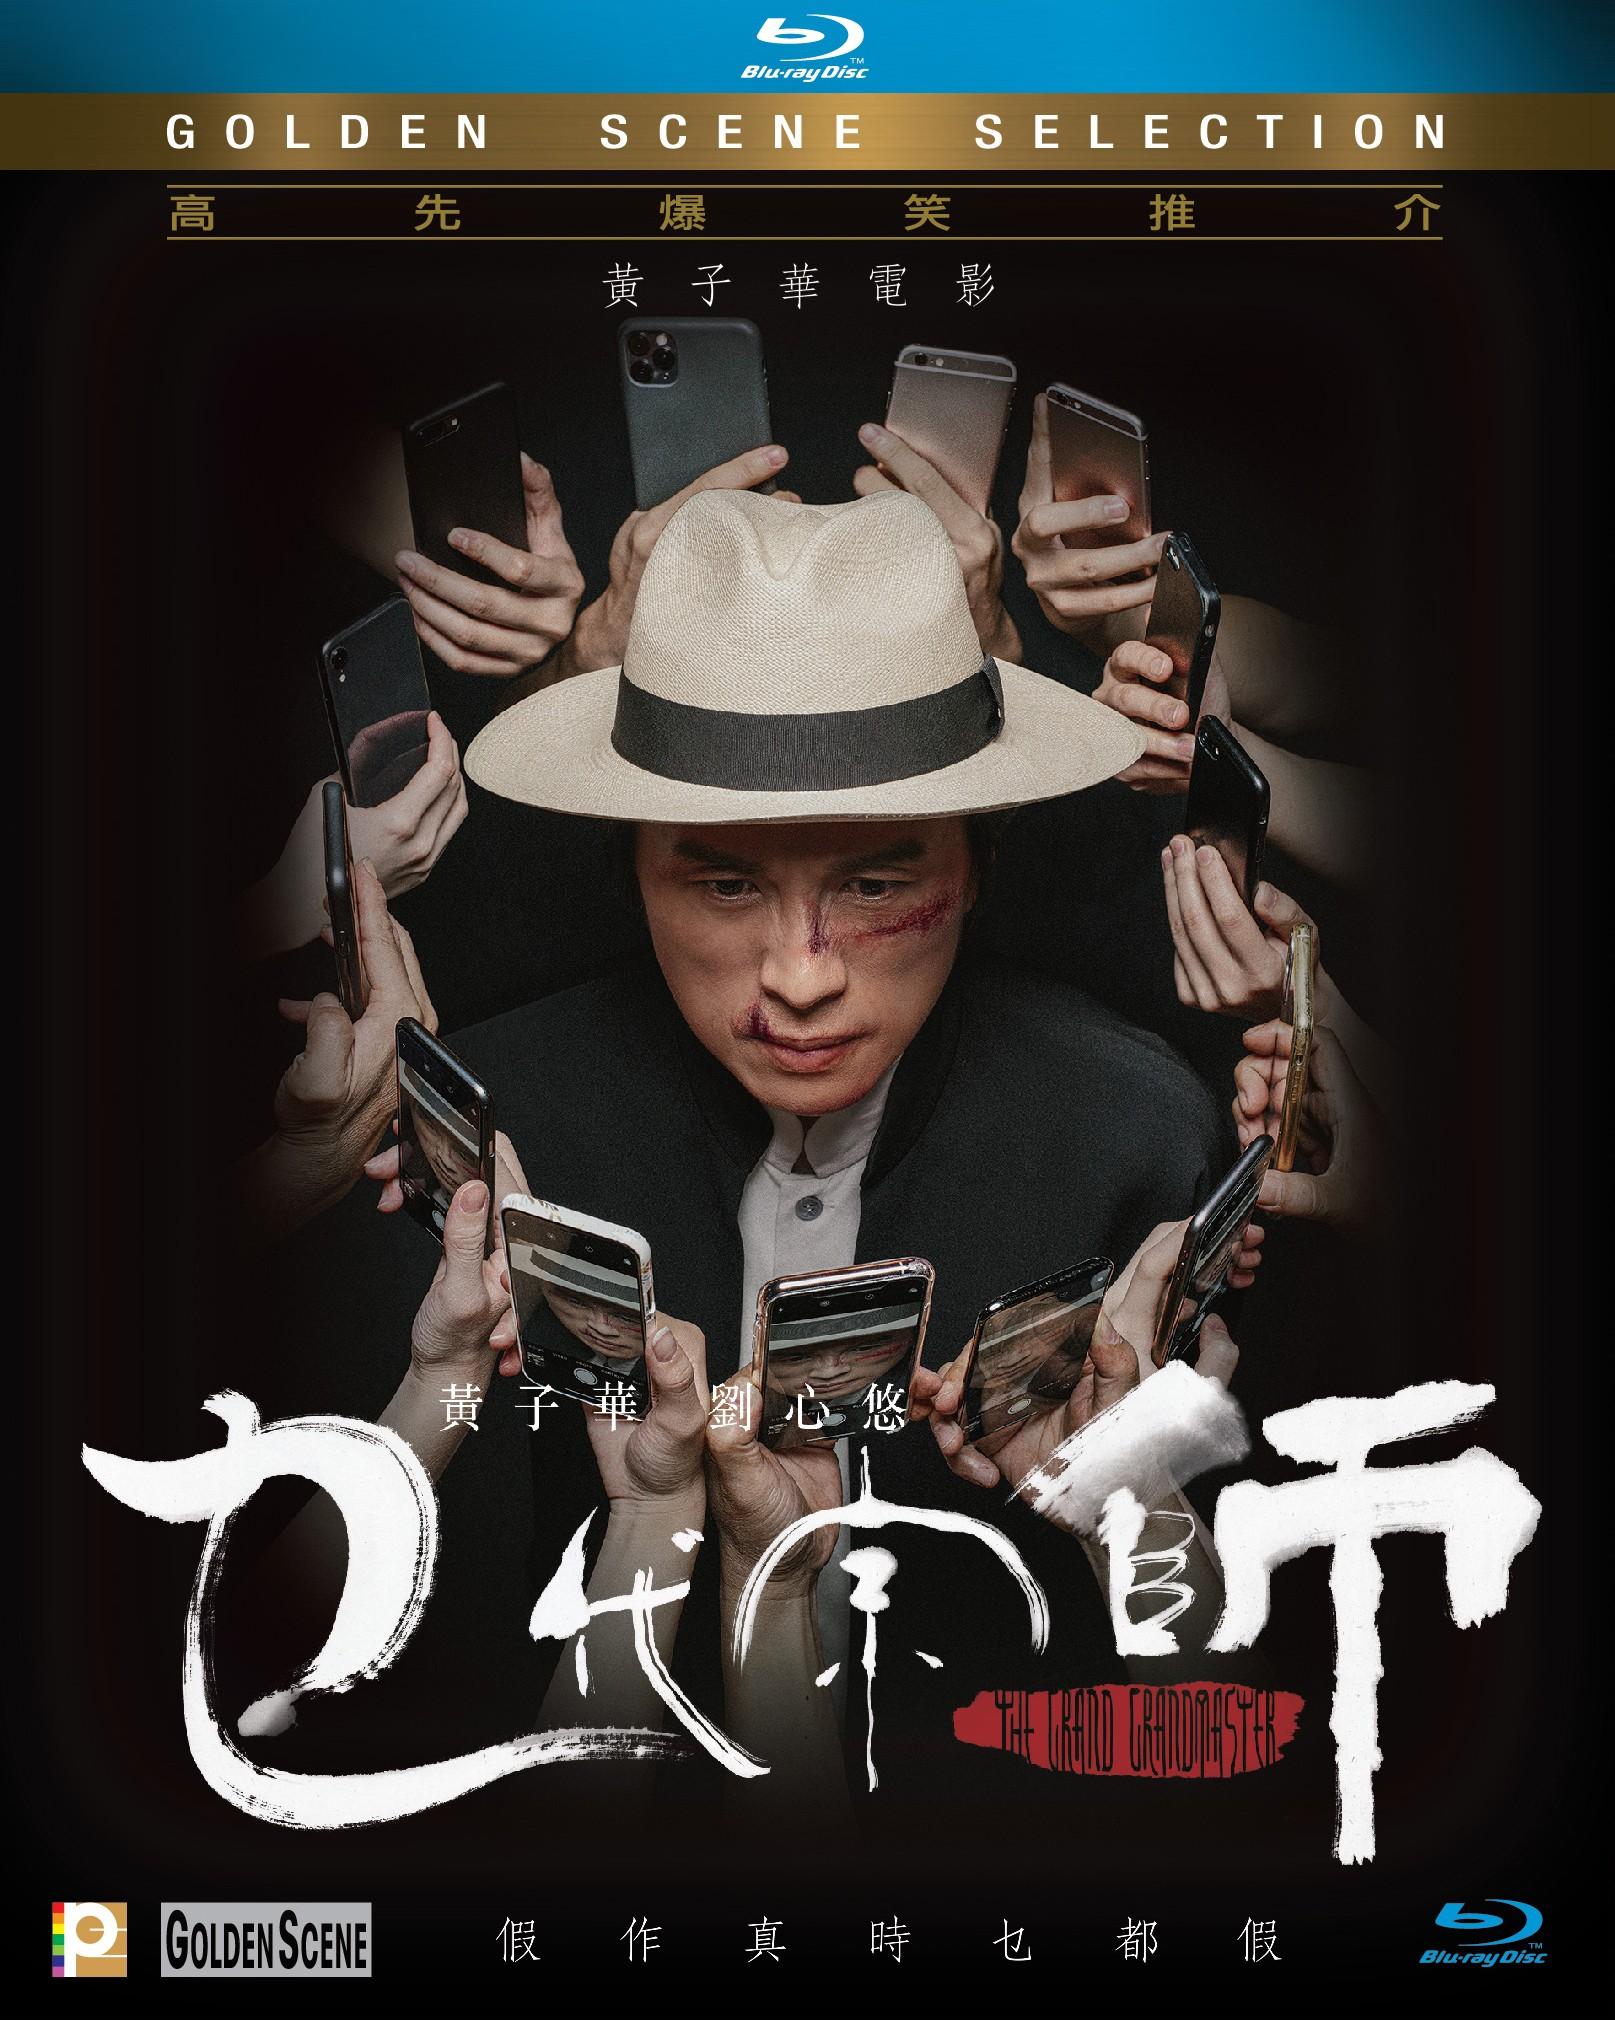 https://shop.panorama.com.hk/hk/comedy/3383--5.html